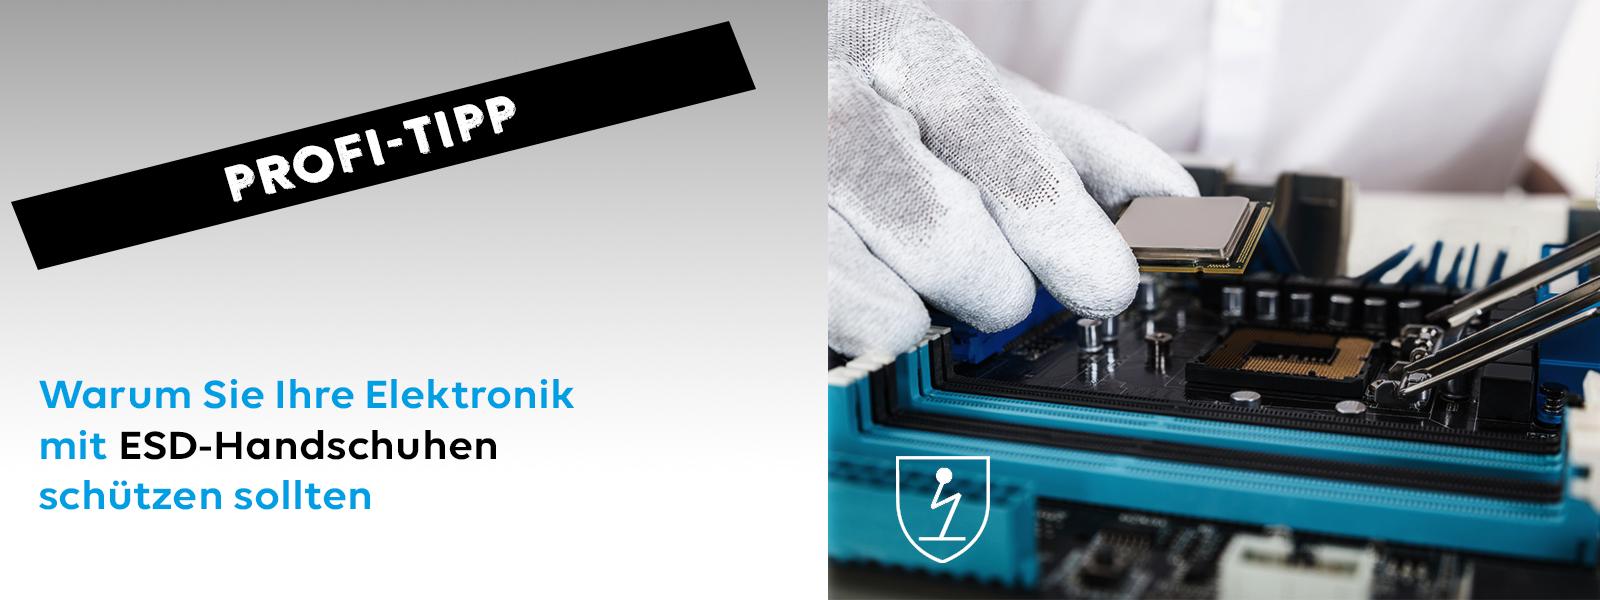 ESD-Handschuhe als sinnvolle Maßnahme gegen elektrostatische Entladung